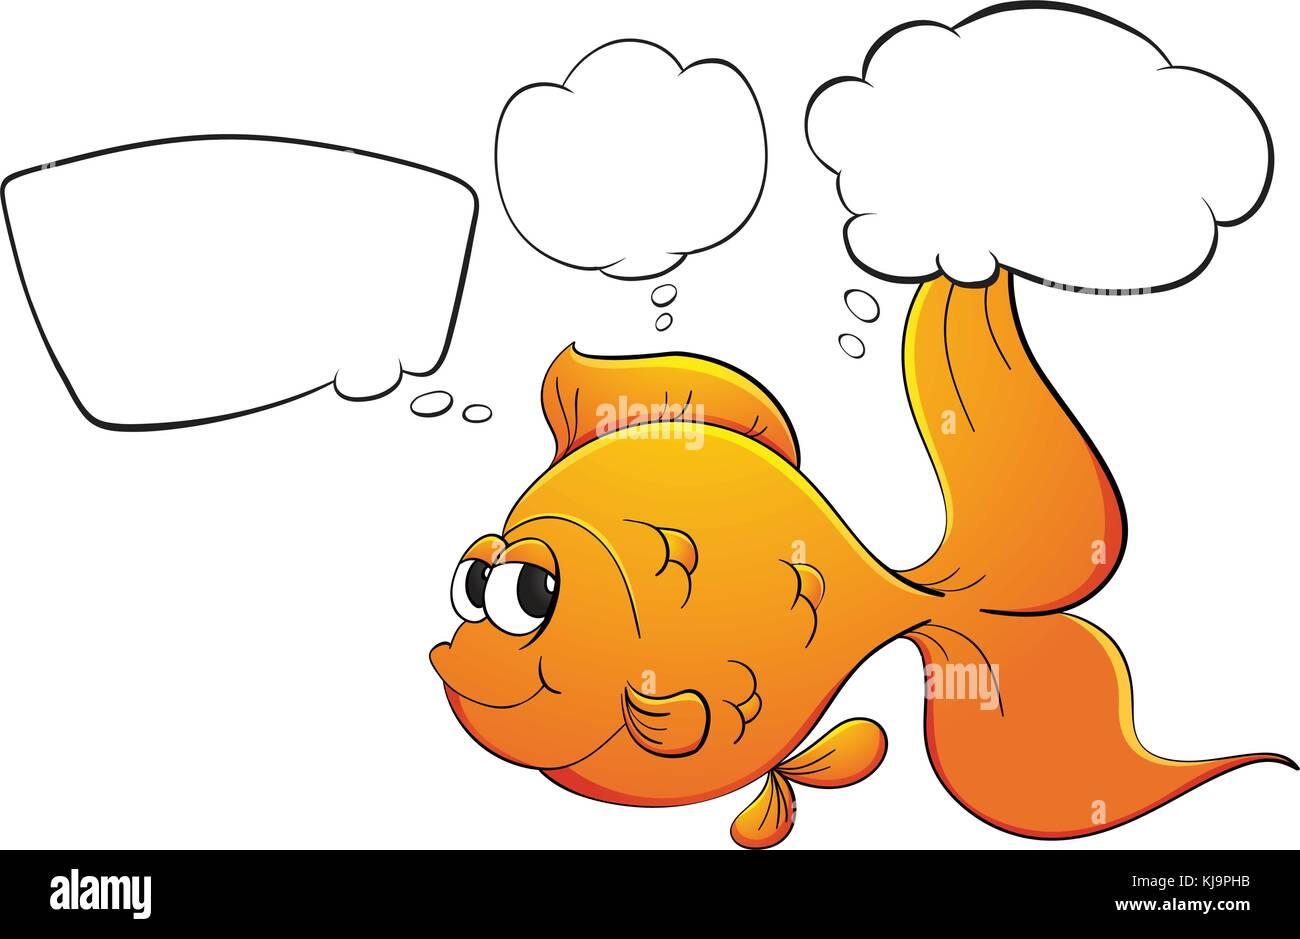 Goldfish Cartoon Imágenes De Stock & Goldfish Cartoon Fotos De Stock ...